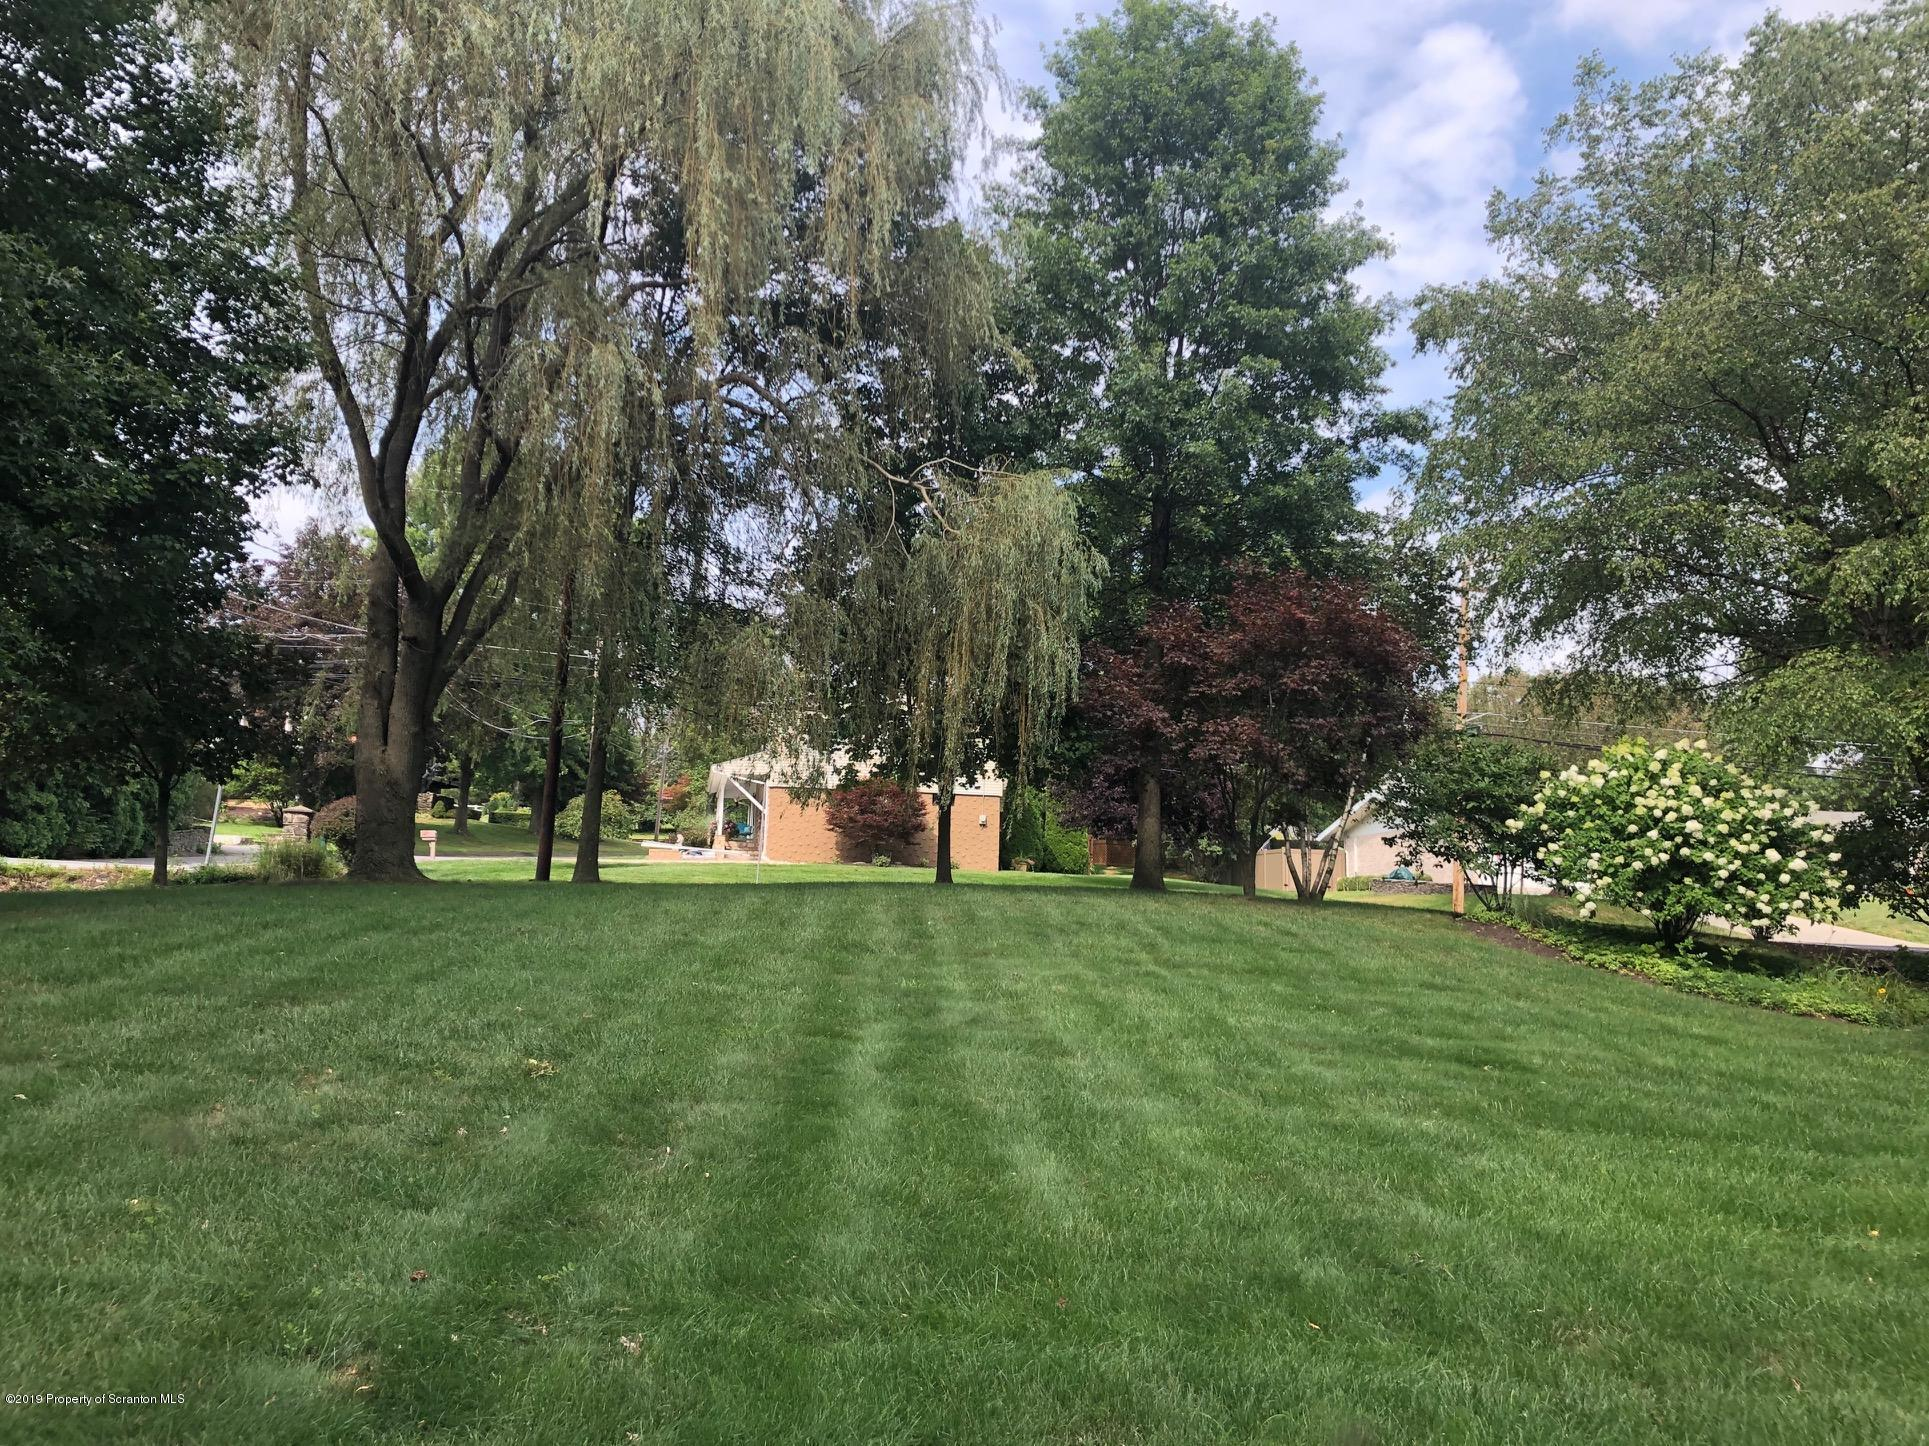 513 Shady Lane Rd. Lot 103, Clarks Summit, Pennsylvania 18411, ,Land,For Sale,Shady Lane Rd. Lot 103,19-3999